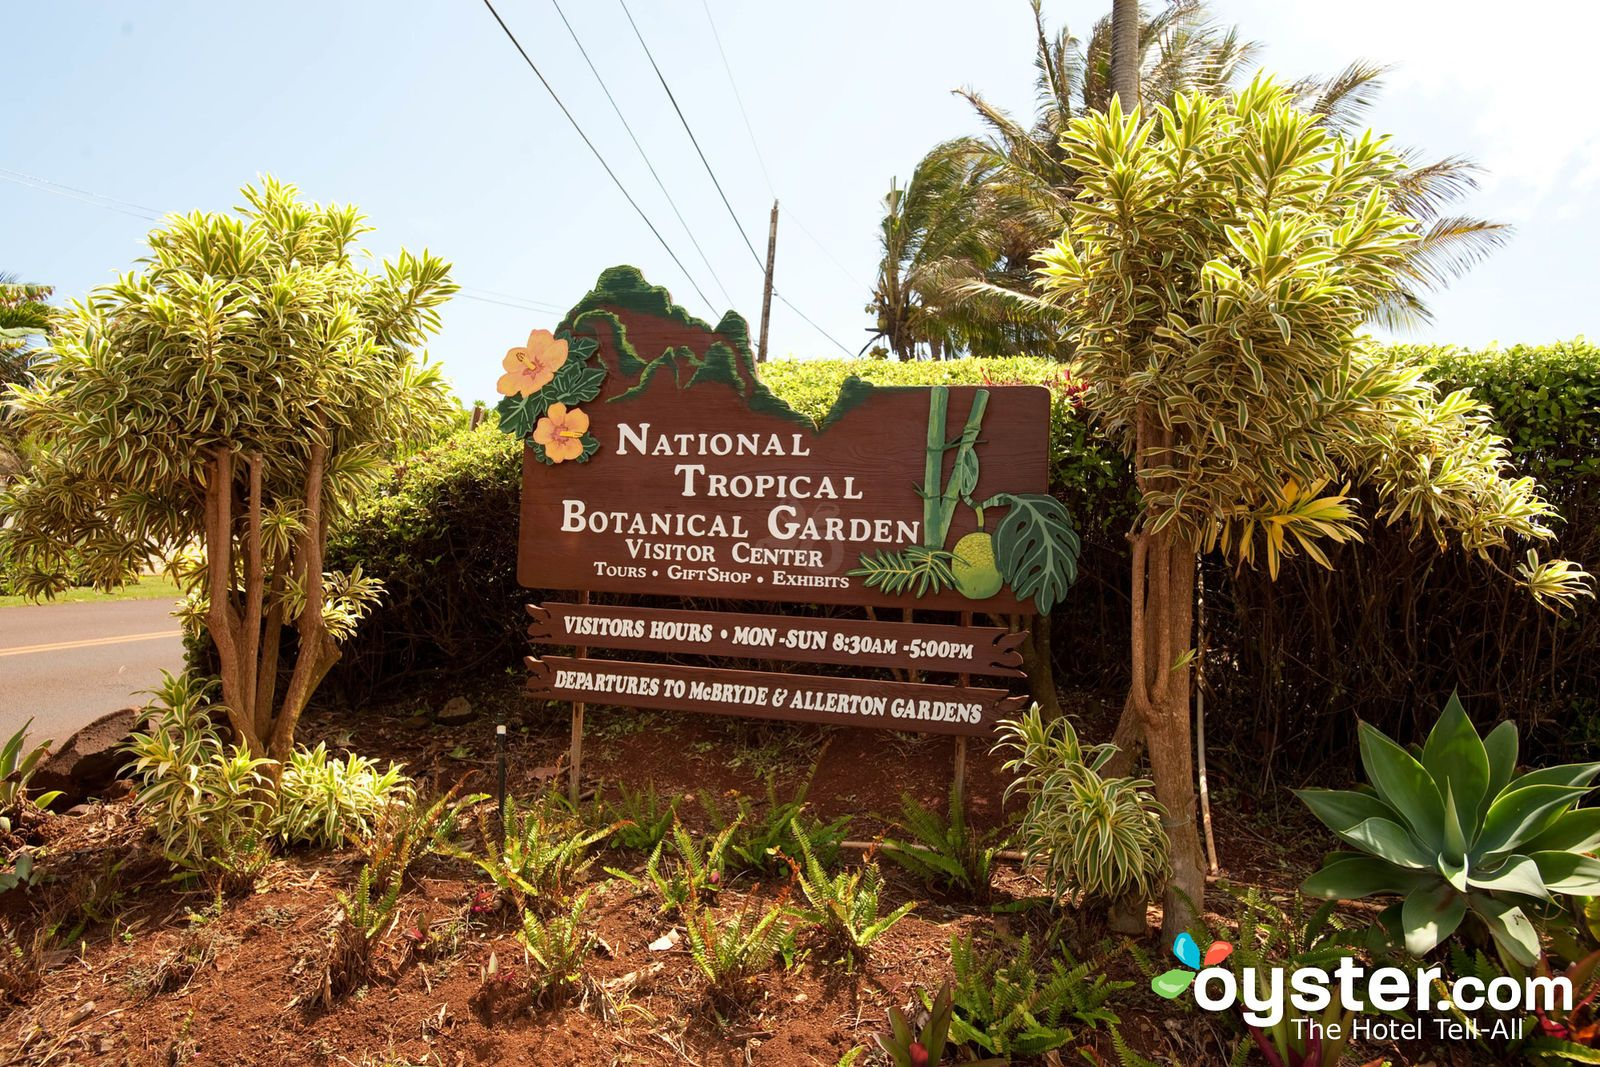 Best In Botanical Garden Kauai National Tropical Botanical